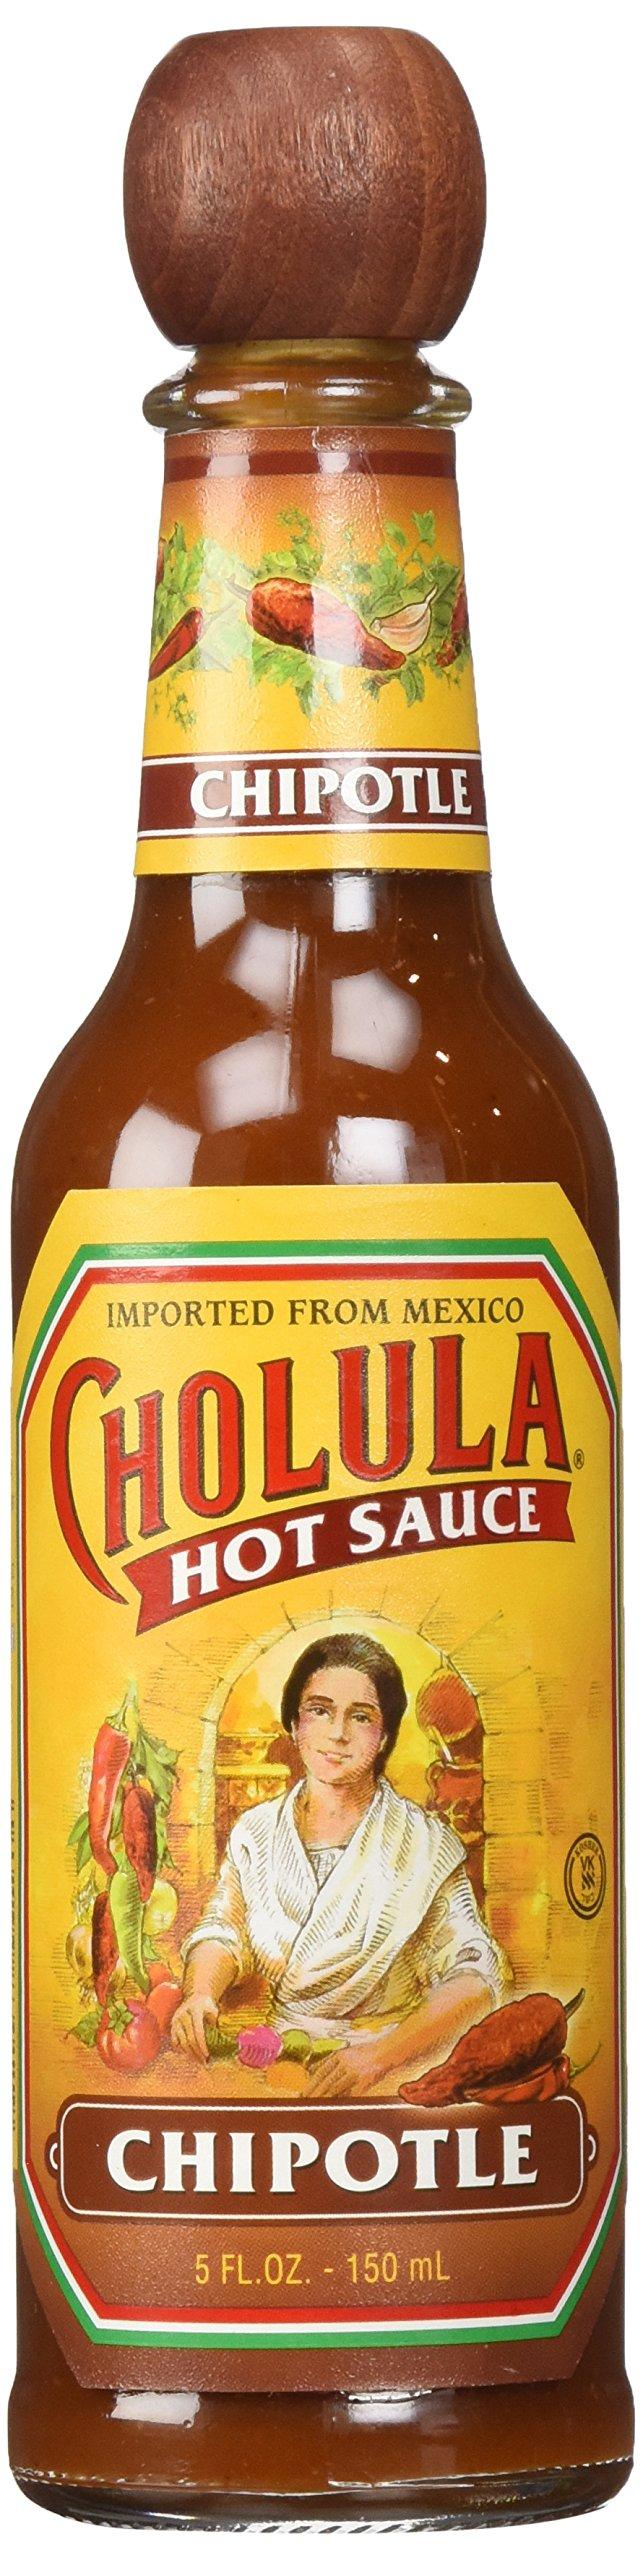 Cholula Chili Chipotle Hot Sauce 5.0 OZ